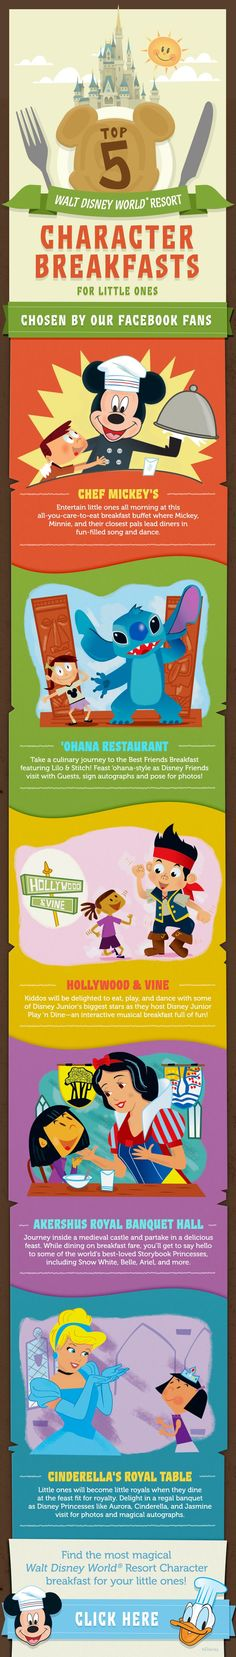 Top 5 Character Breakfasts for little ones at Walt Disney World! disney world tips & tricks #traveltips #disney